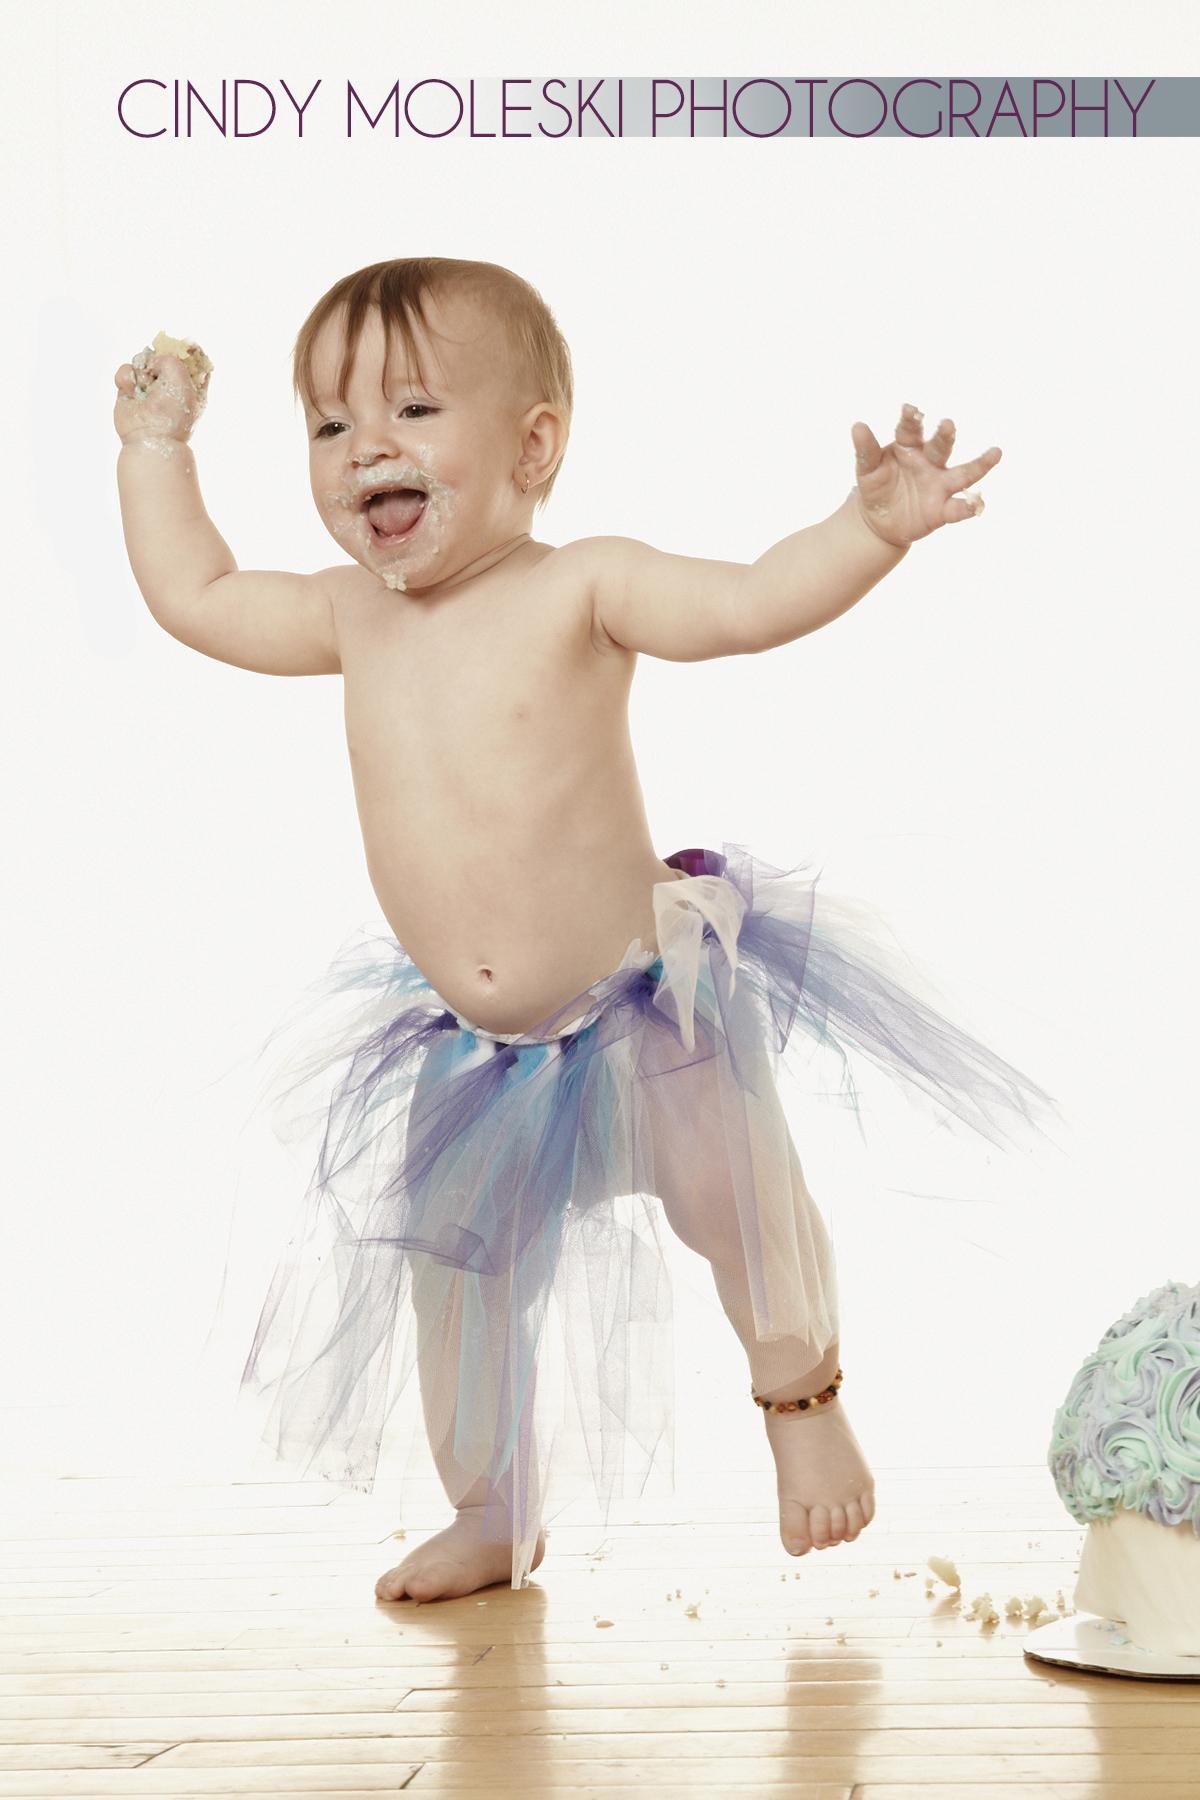 Cake-Smash-professional-photography-cindy-moleski-saskatoon-saskatchewan-children-toddler-baby-birthday28611 8172FB.jpg